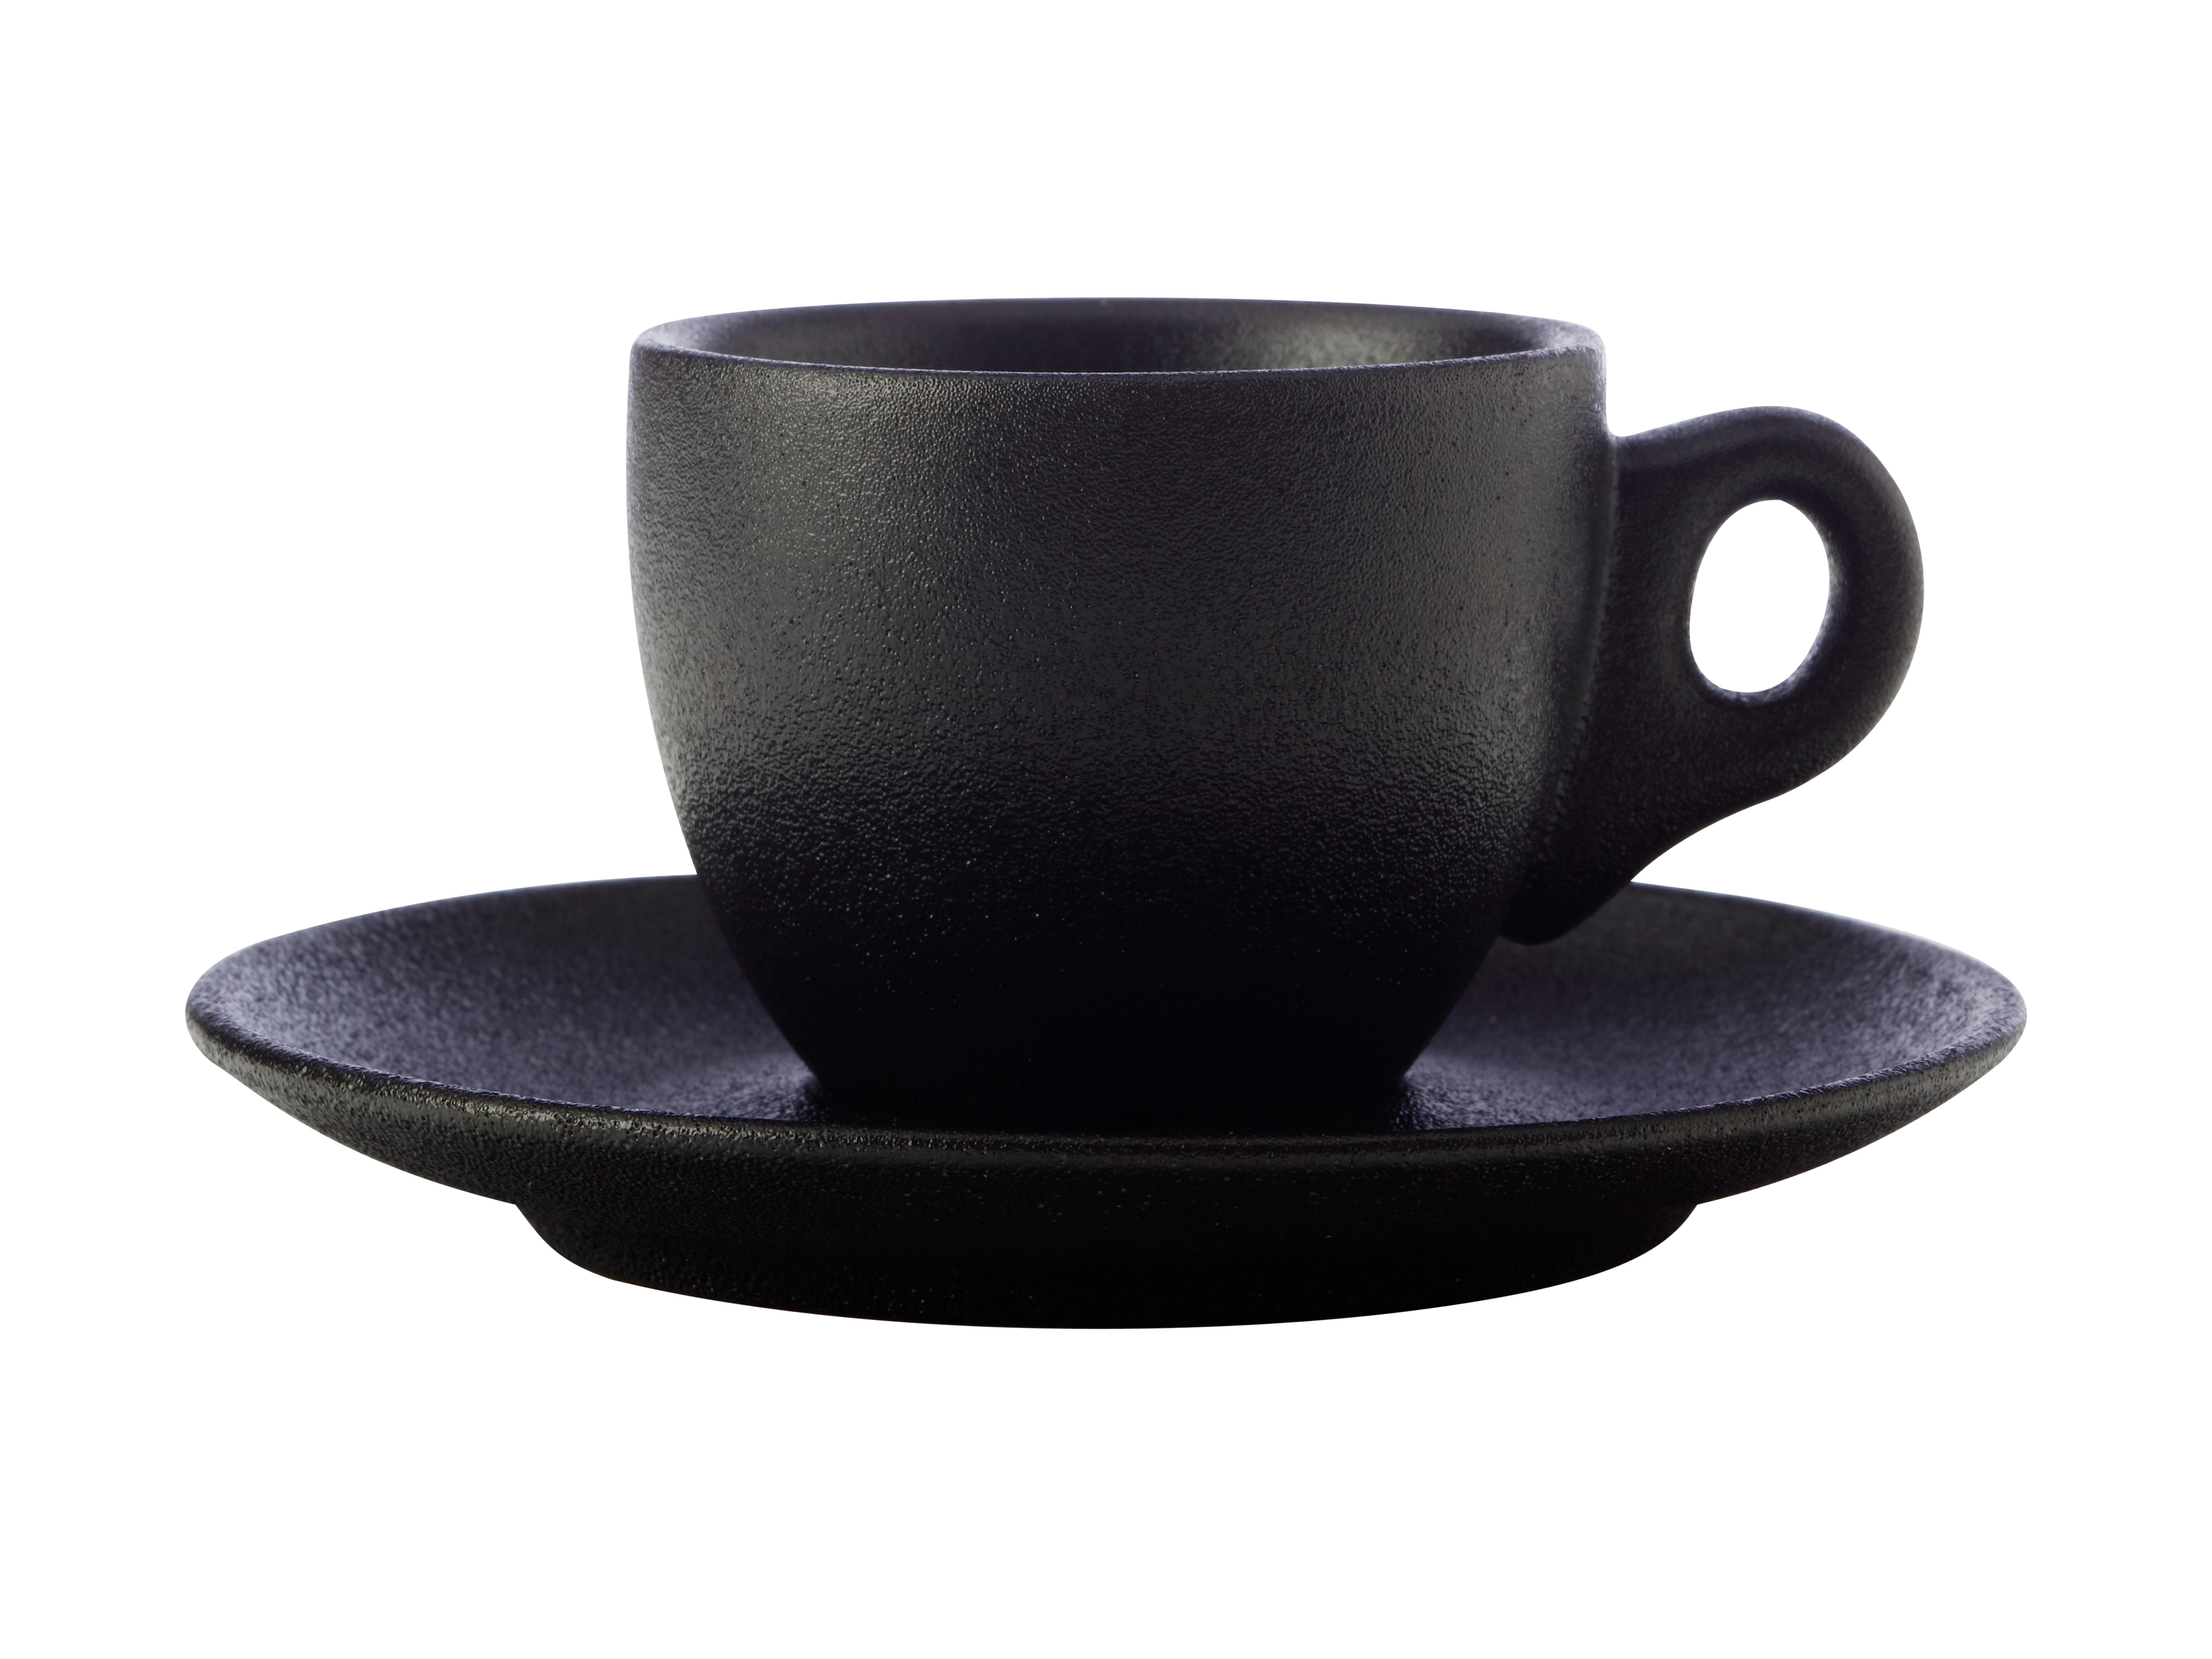 Maxwell Williams Caviar Demi Cup & Saucer 100ml